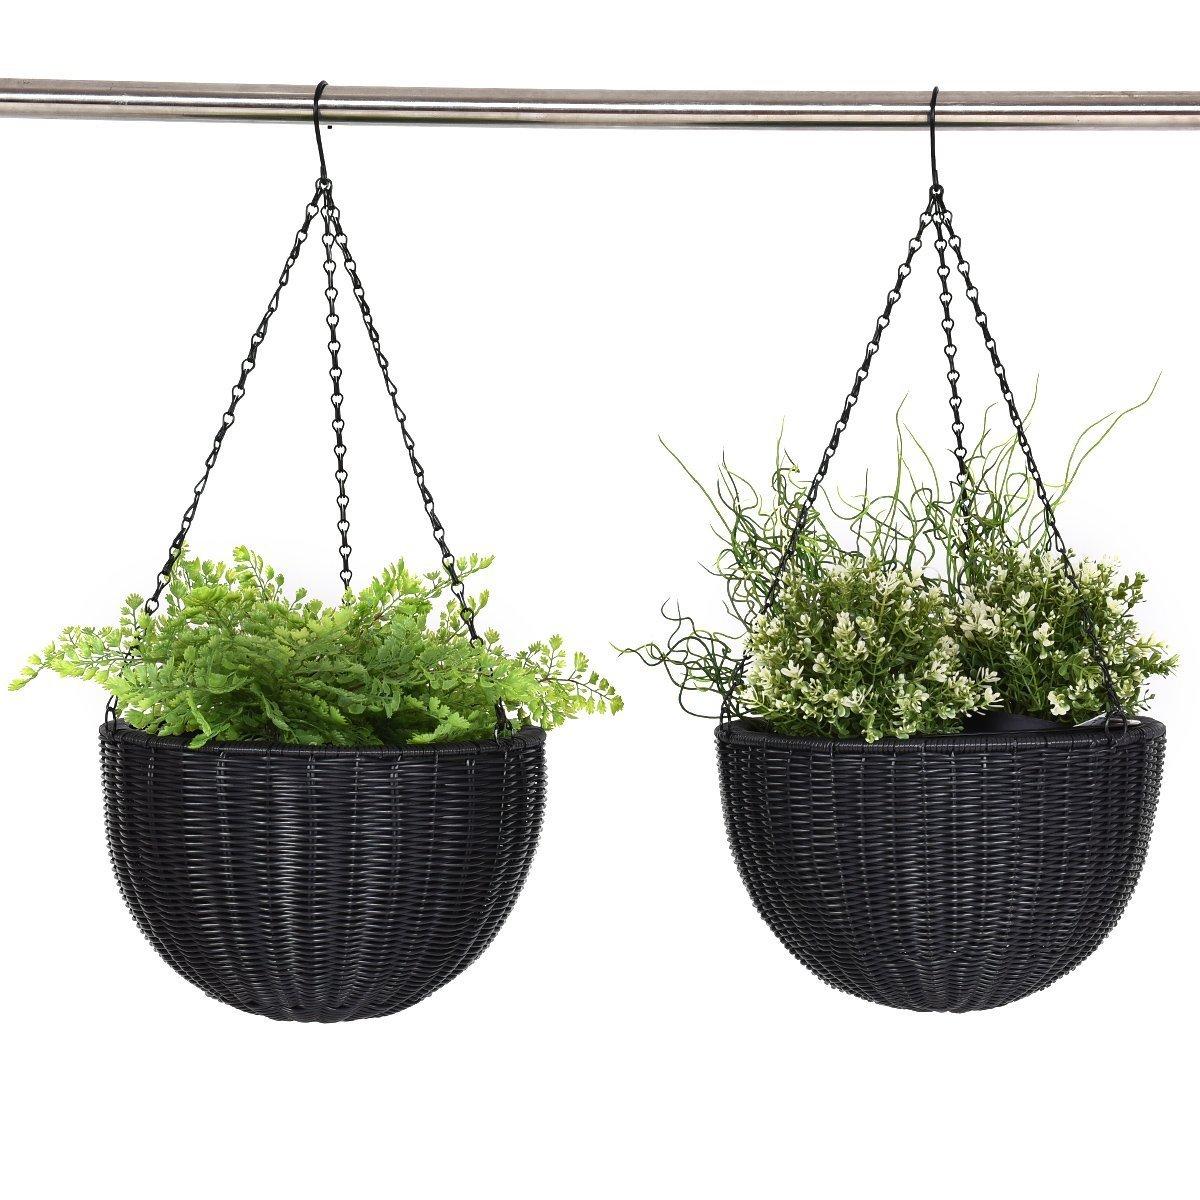 Giantex Outdoor Garden Hanging Planter Round Decor PE Rattan Hanging Planter Pot (1-Pack)